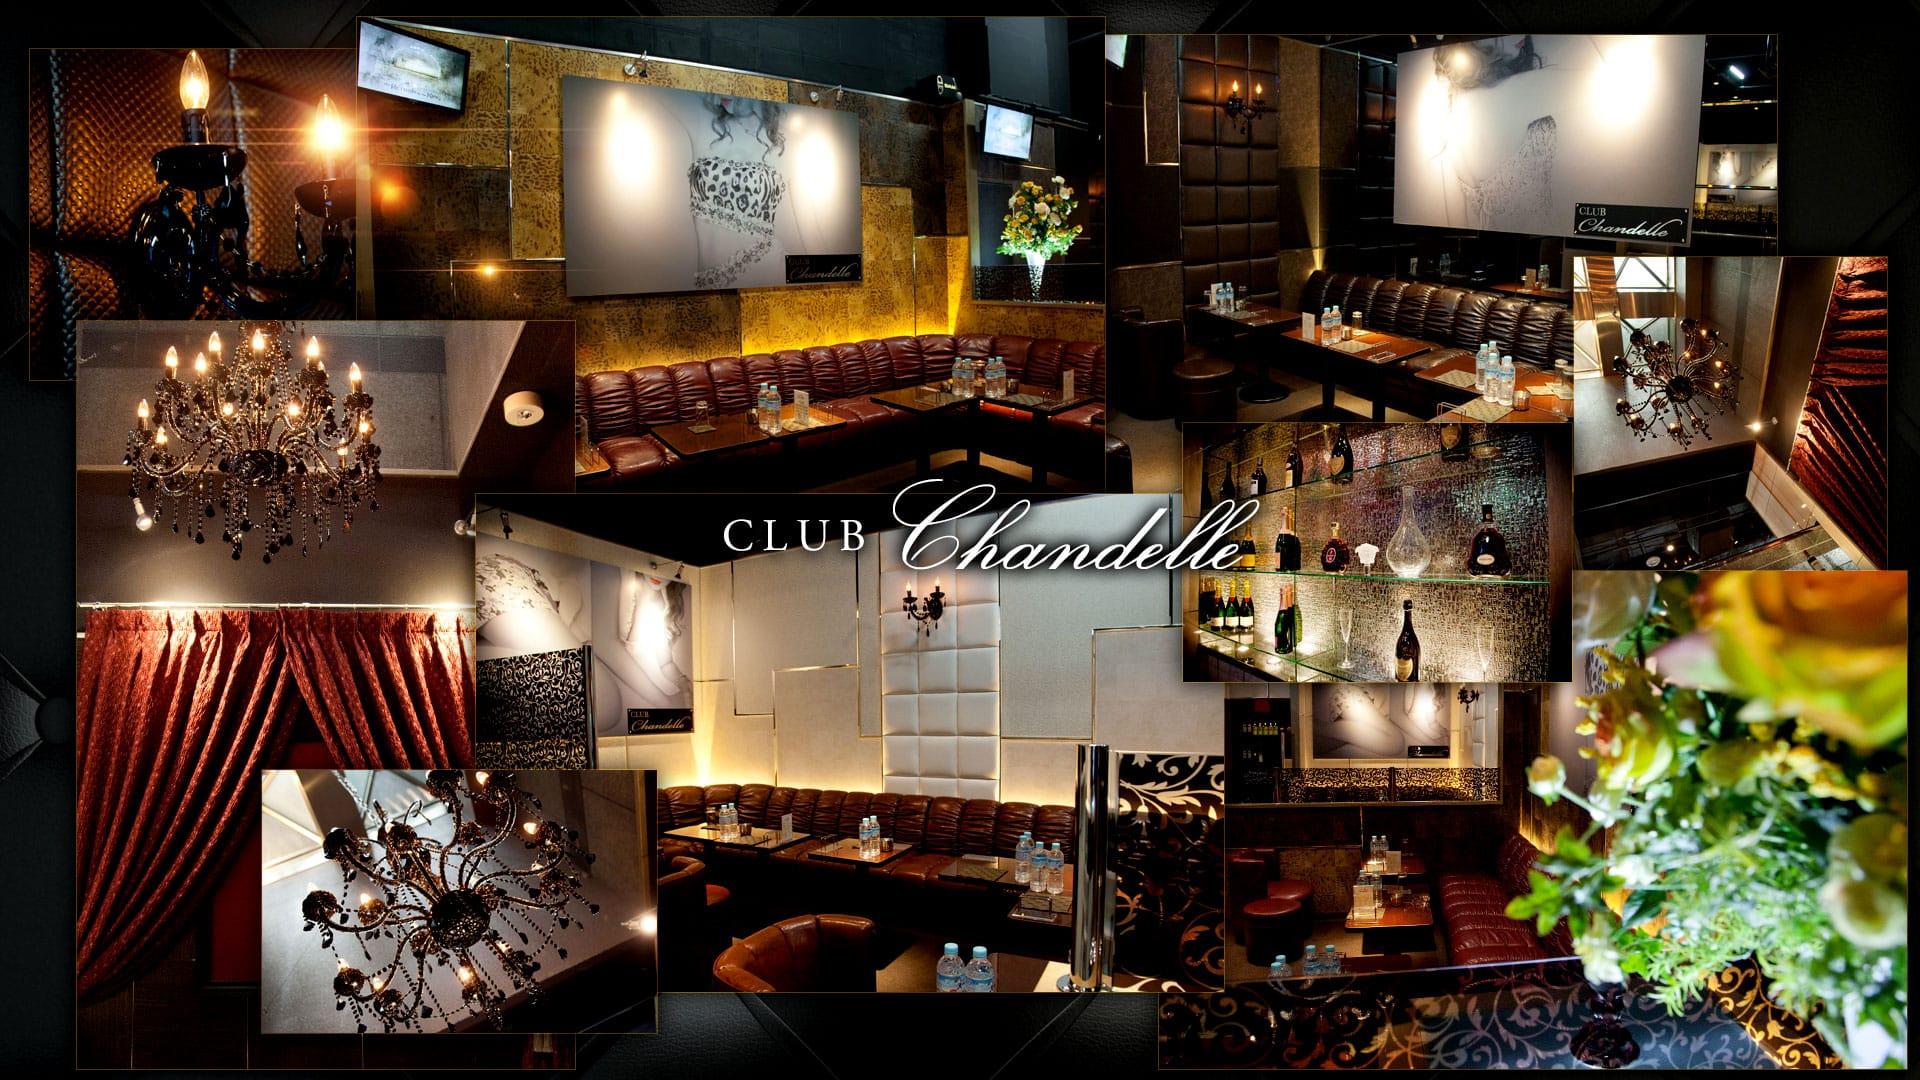 Club Chandelle~クラブ シャンデル~ TOP画像